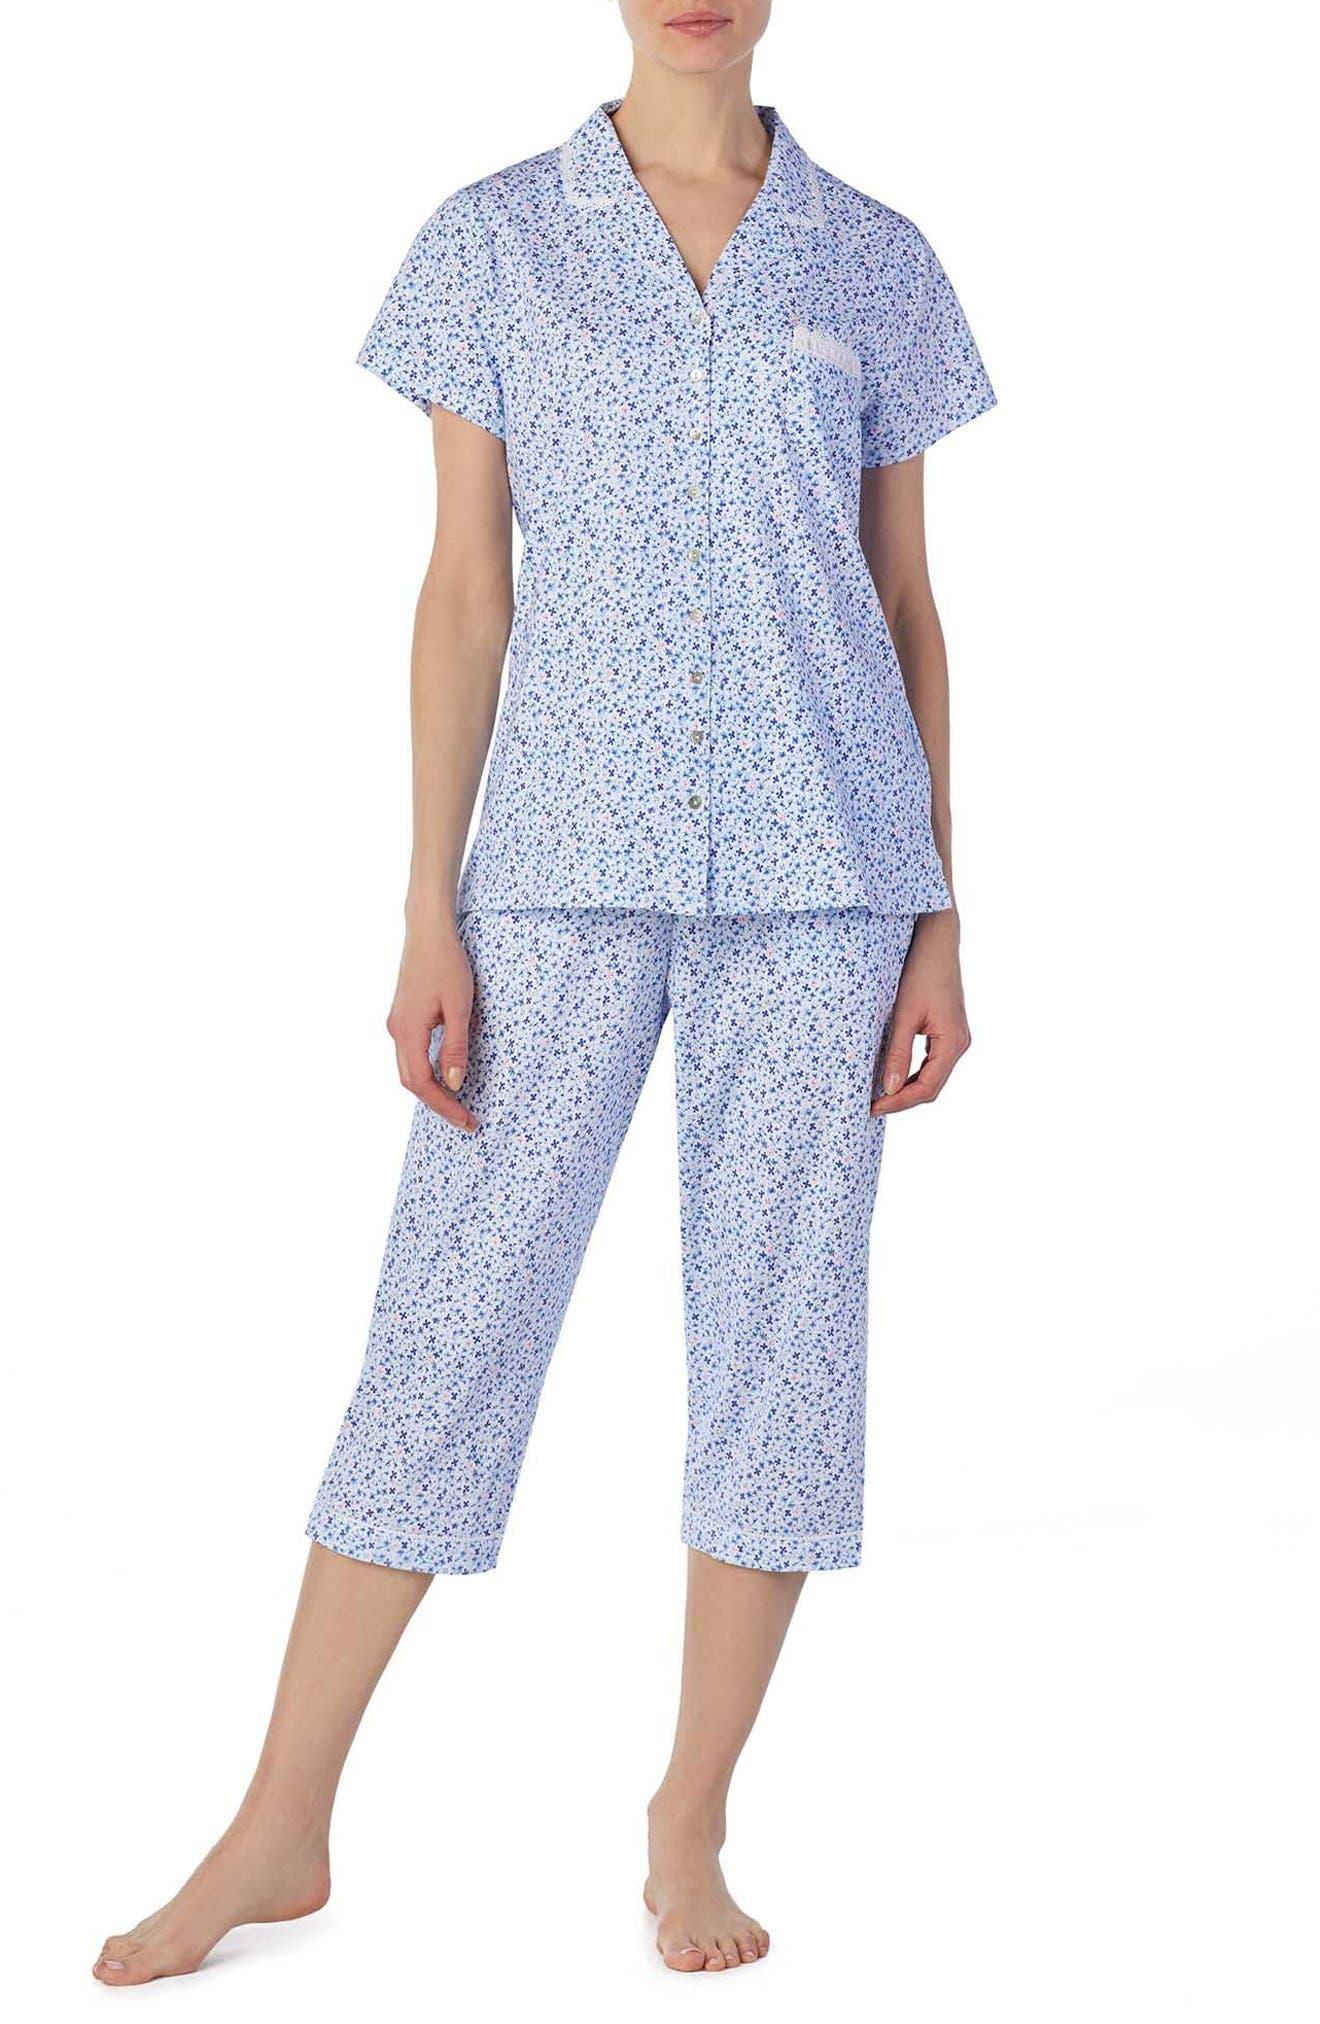 Jersey Capri Pajamas,                             Main thumbnail 1, color,                             Pink/ Blue